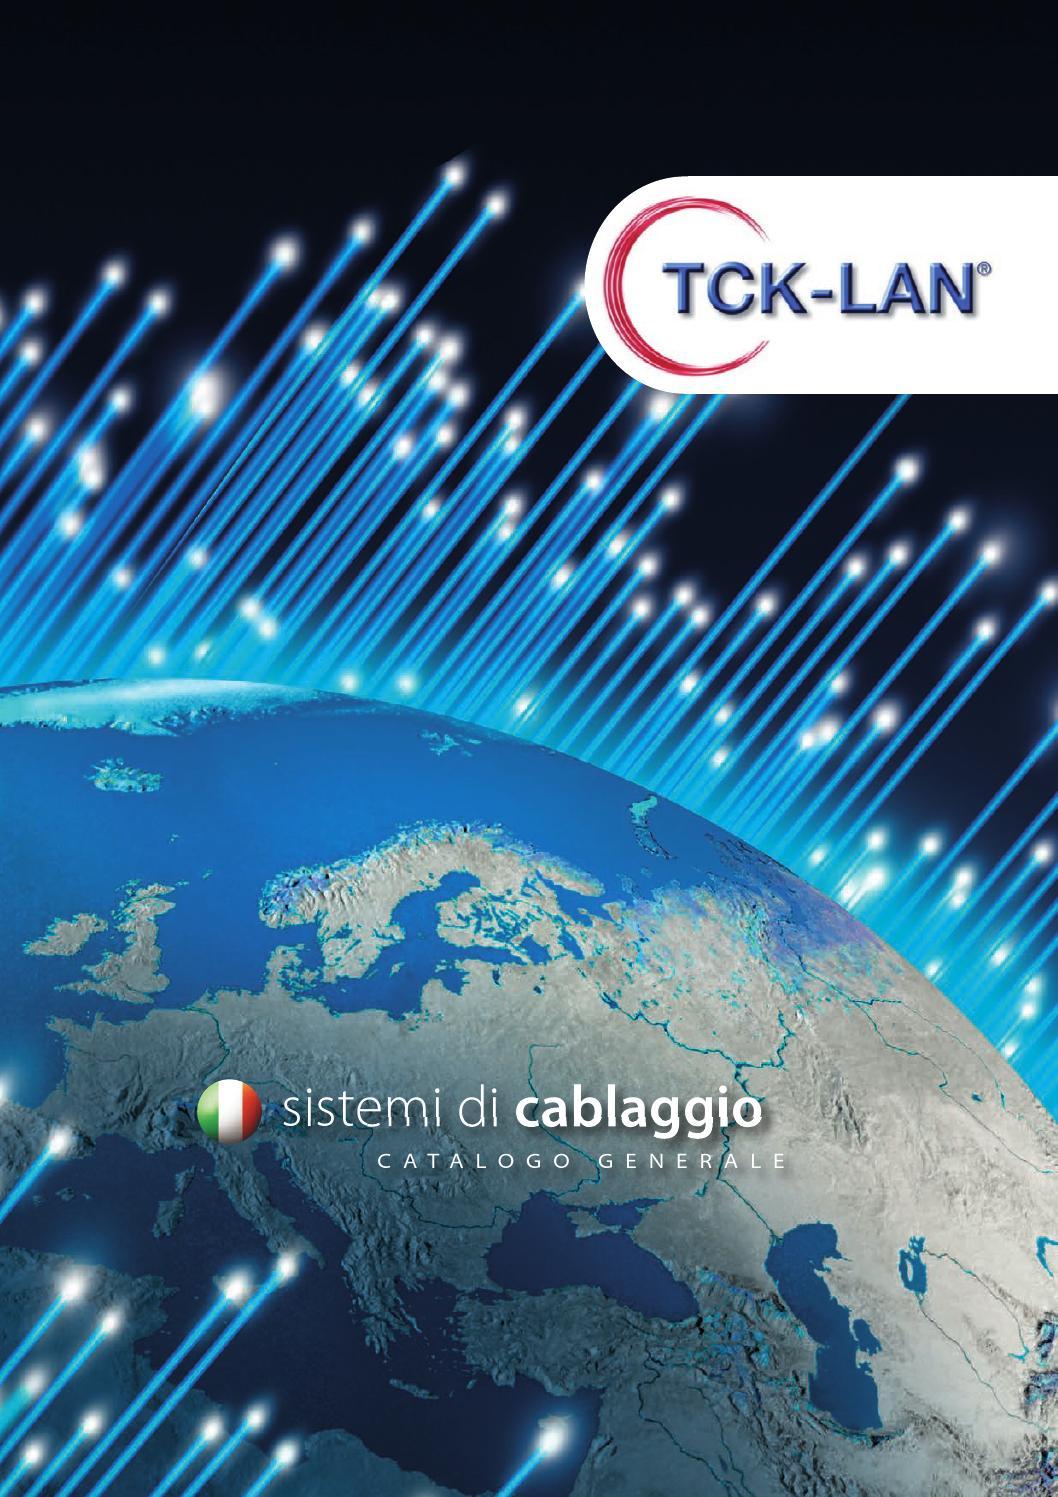 Schema Cablaggio Cavo Lan : Tck lan catalogo by digital media issuu